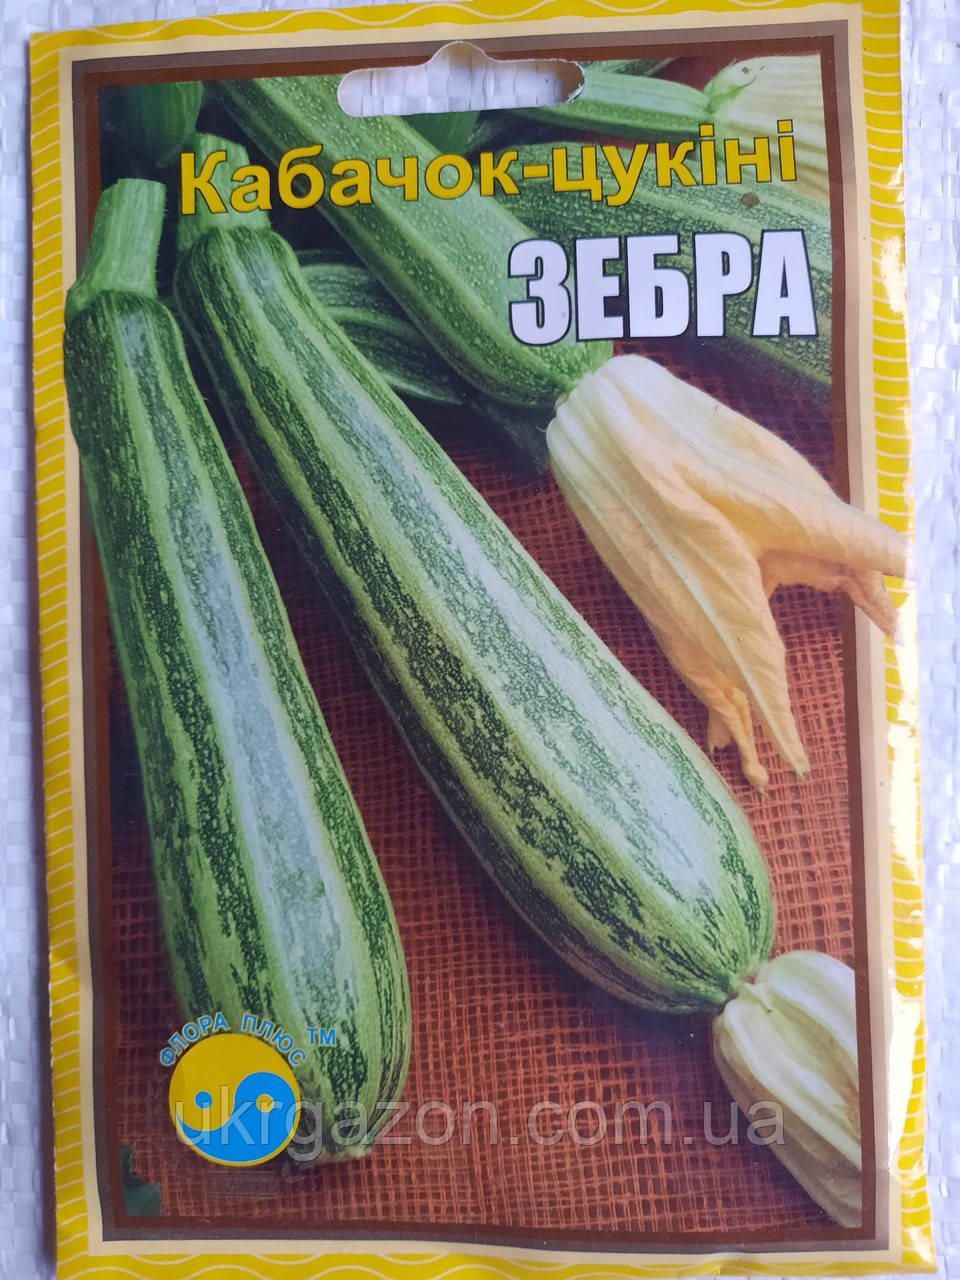 Кабачок -цукіні ЗЕБРА  15 грам (ТМ Флора плюс)